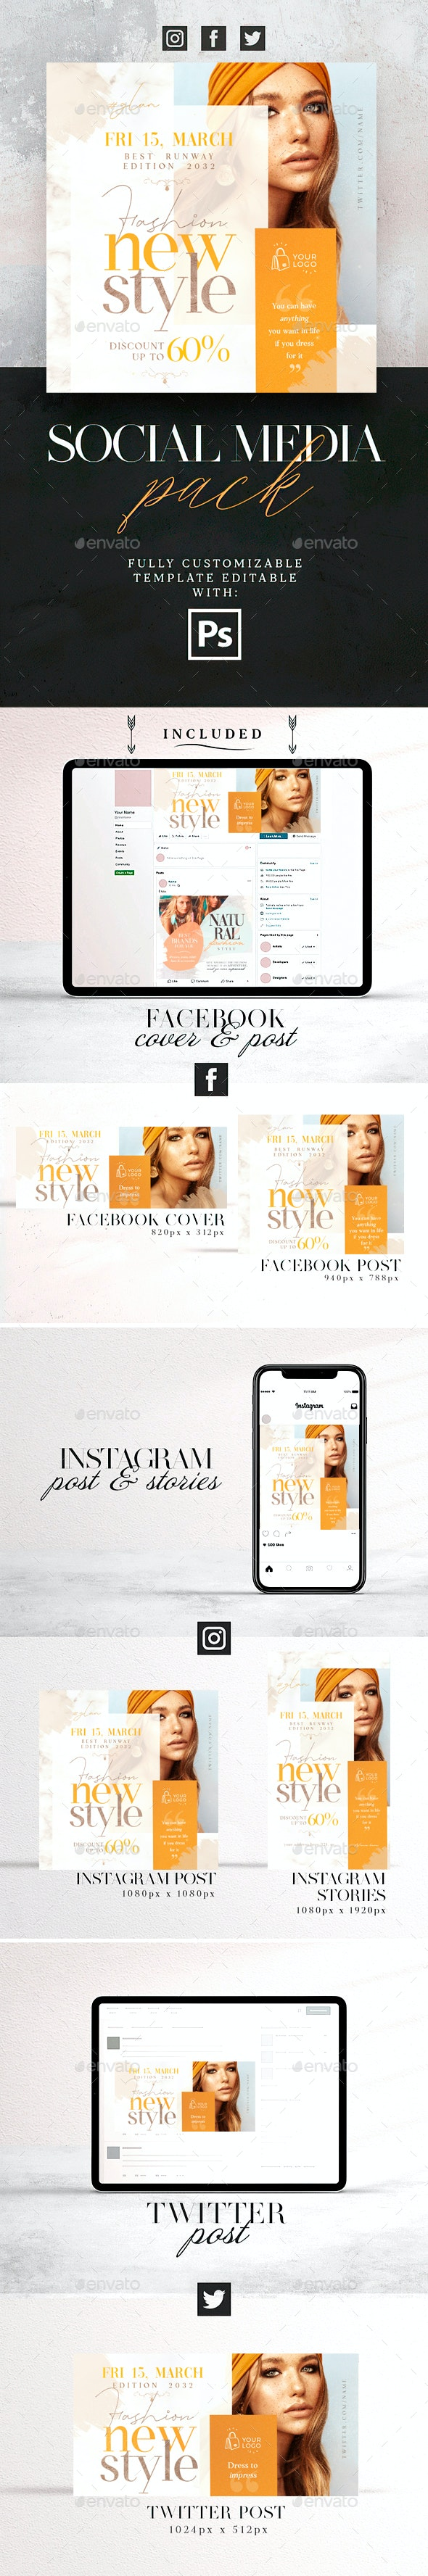 New Style Social Media Pack - Social Media Web Elements